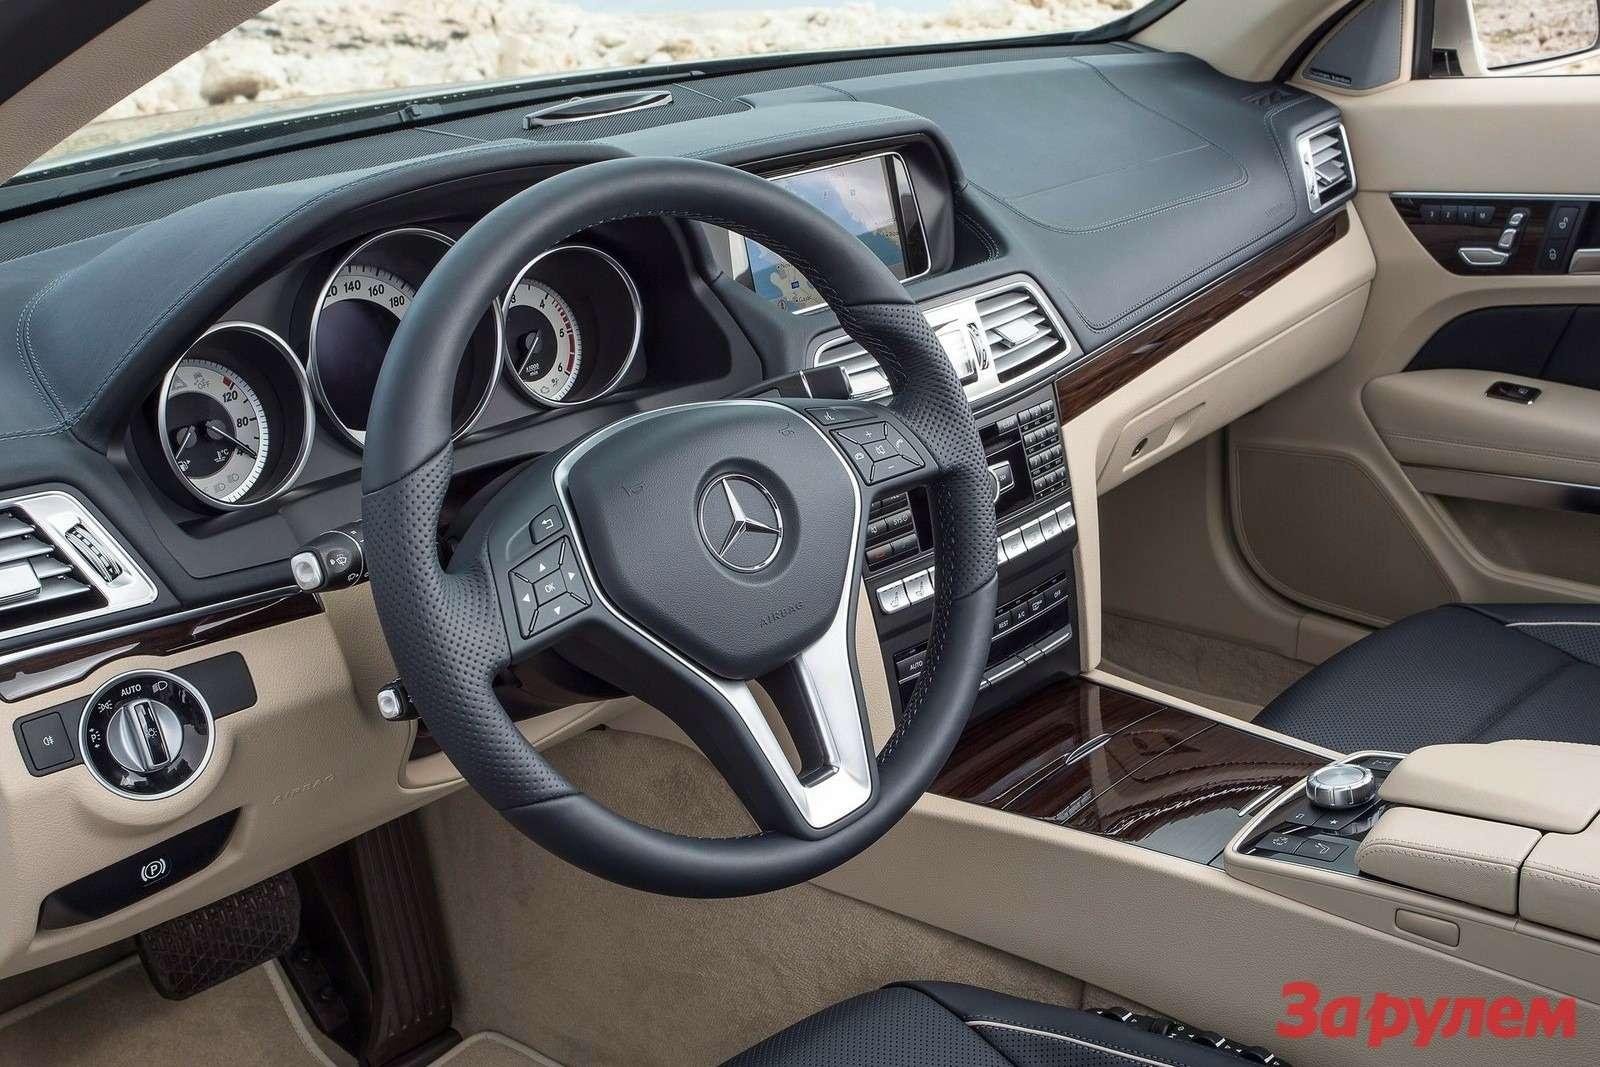 Mercedes-Benz-E-Class_Cabriolet_2014_1600x1200_wallpaper_13